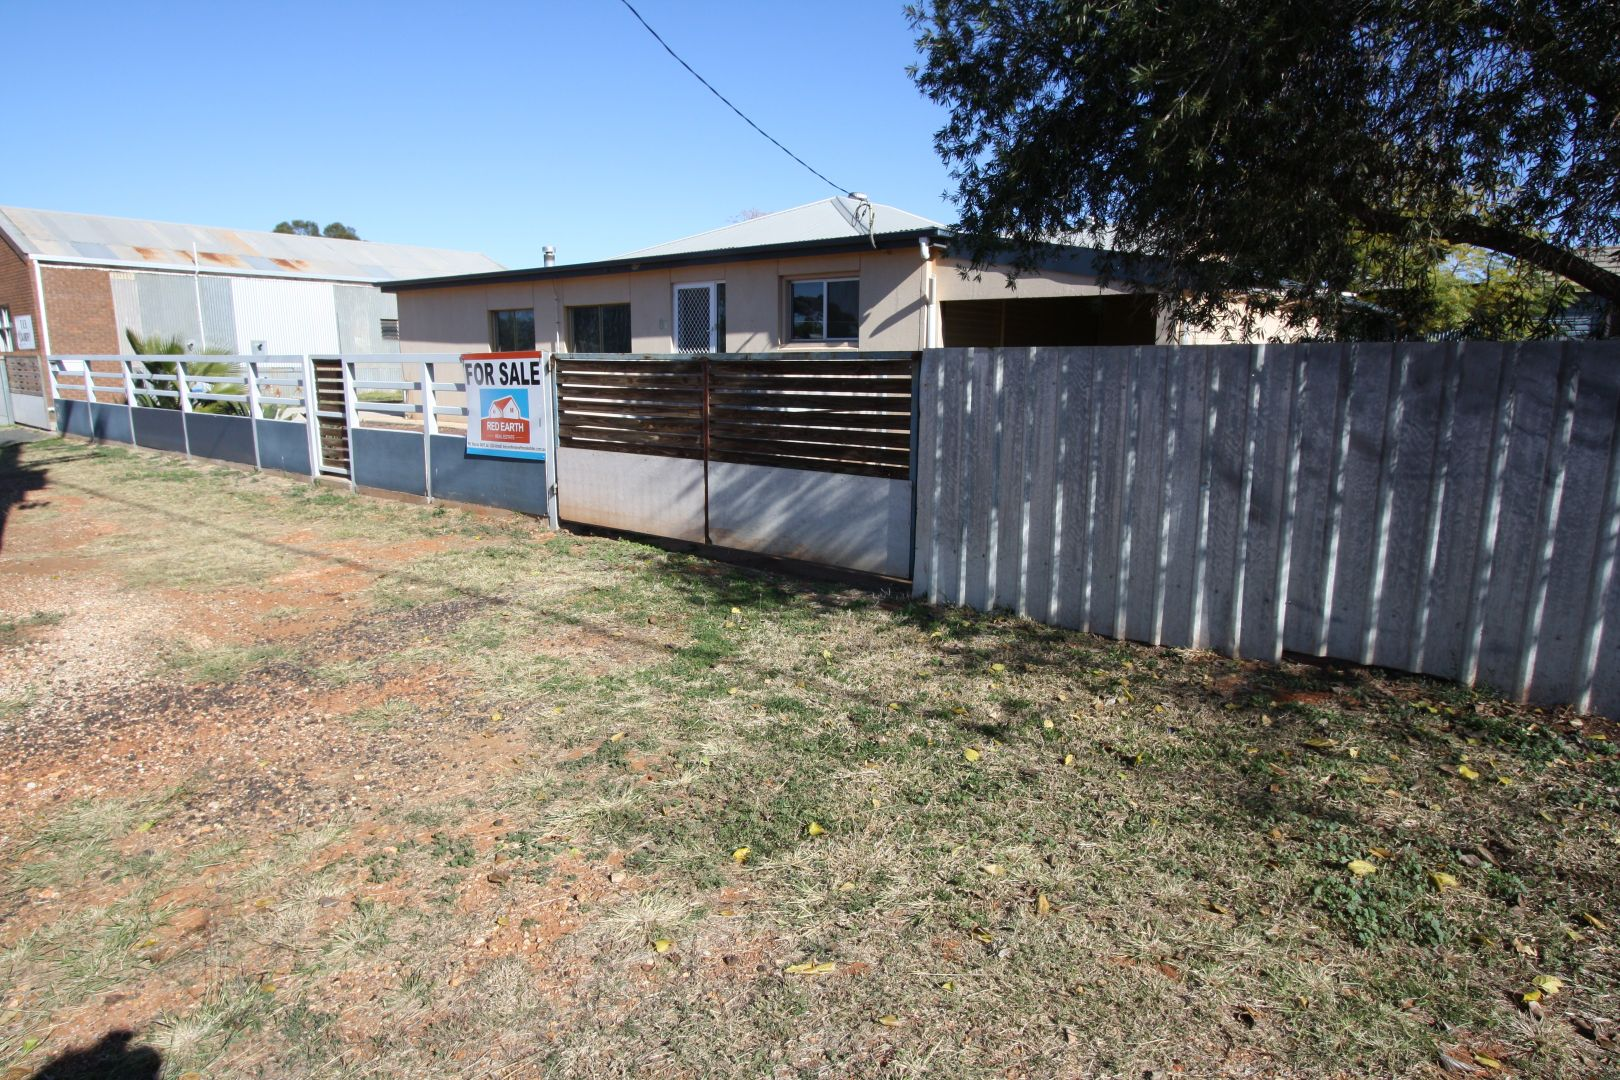 81 MONAGHAN ST, Cobar NSW 2835, Image 1